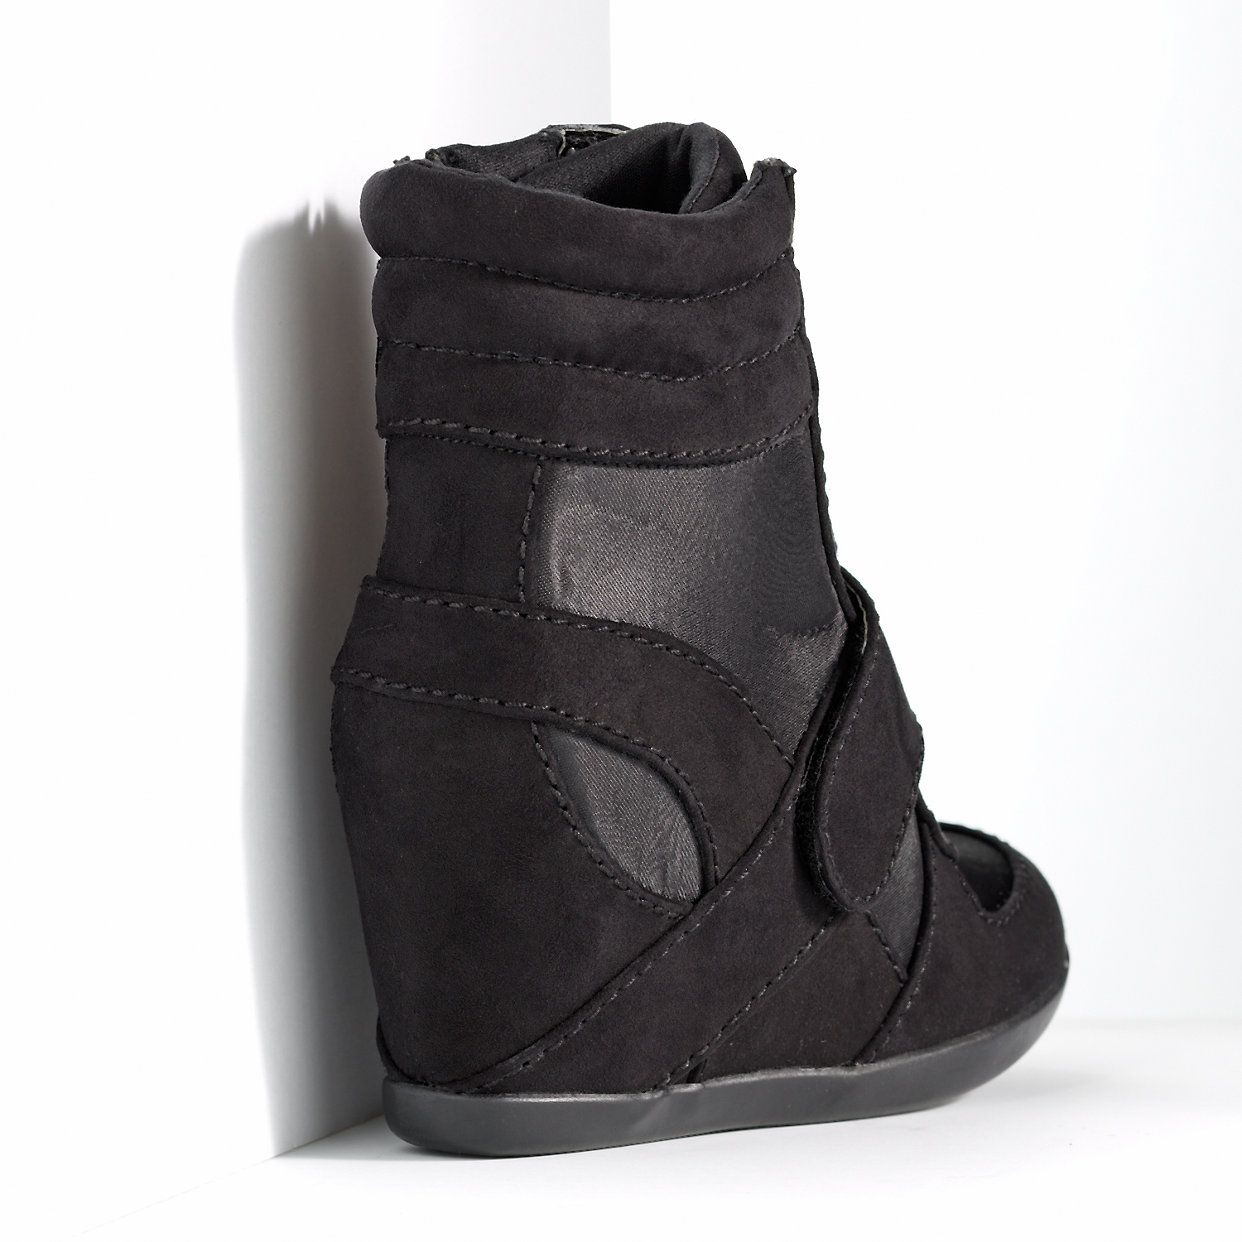 Simply Vera Vera Wang Wedge Sneakers - Women